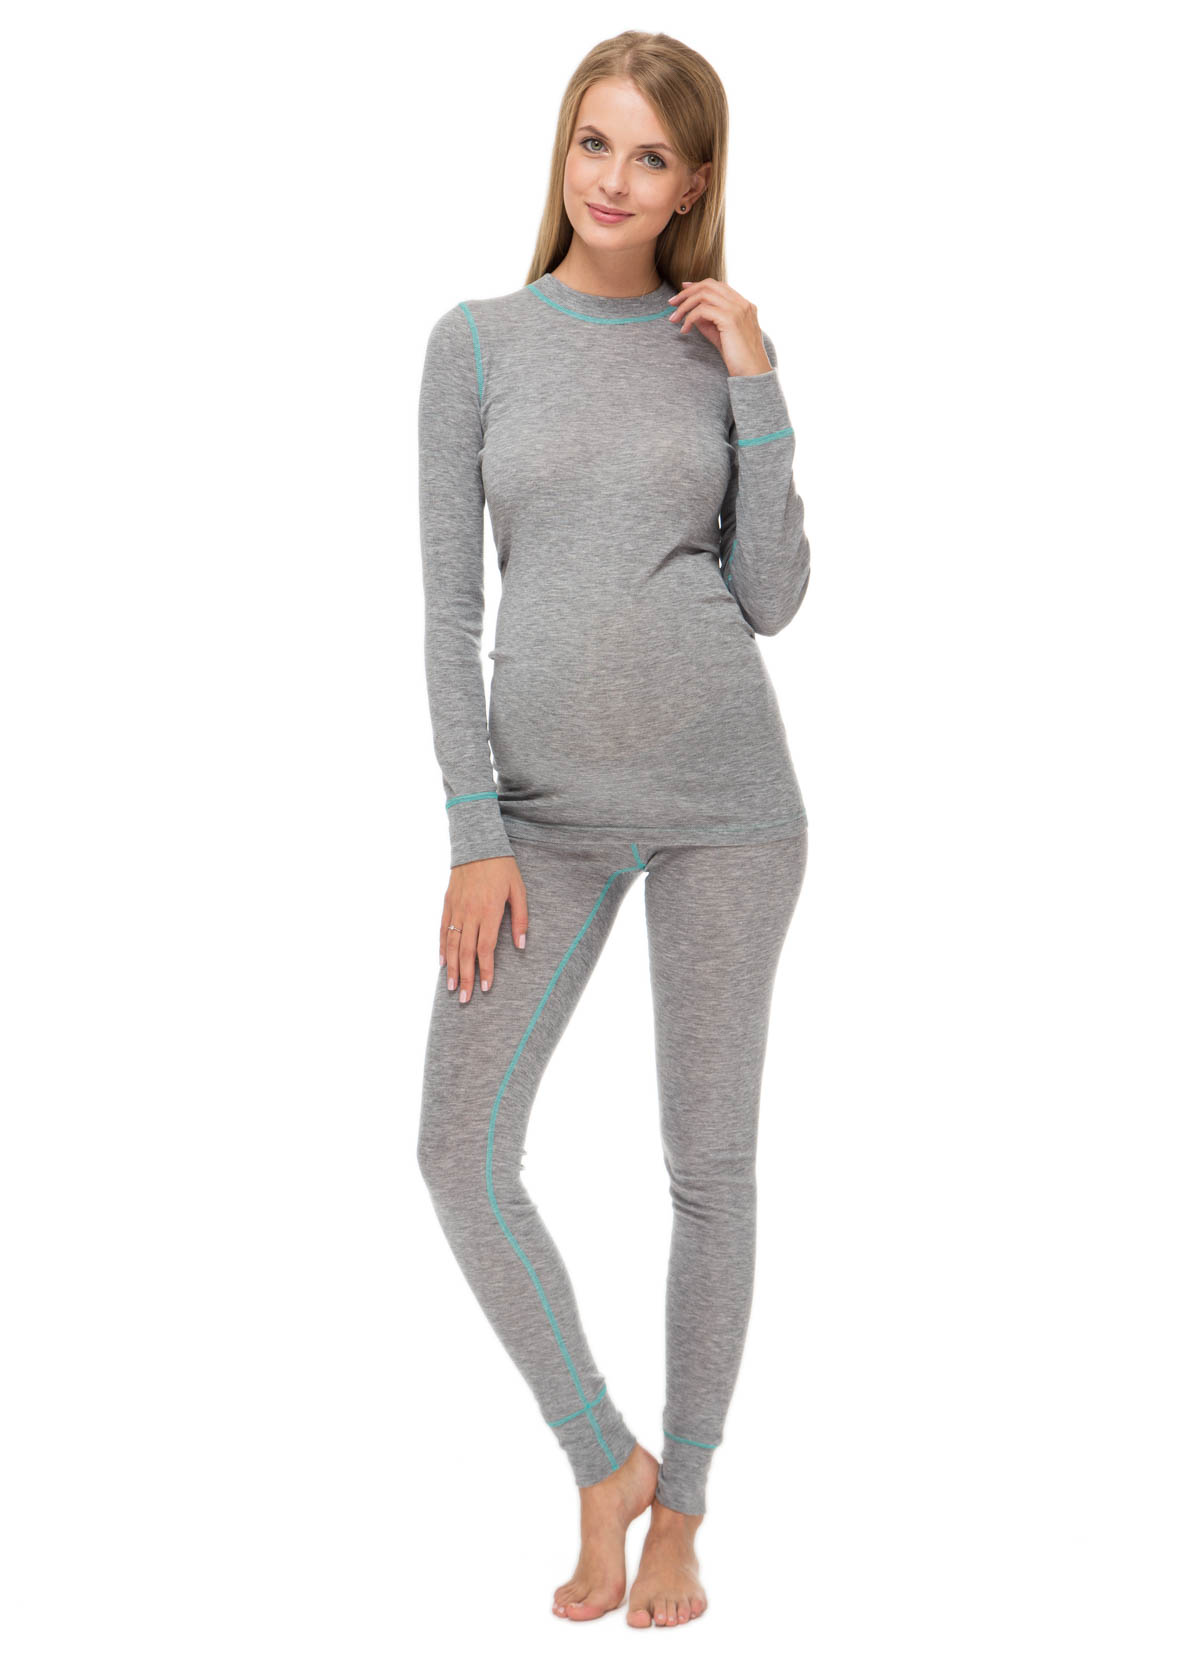 UralMama.com - женская одежда, на все случаи жизни.. Thermo ...